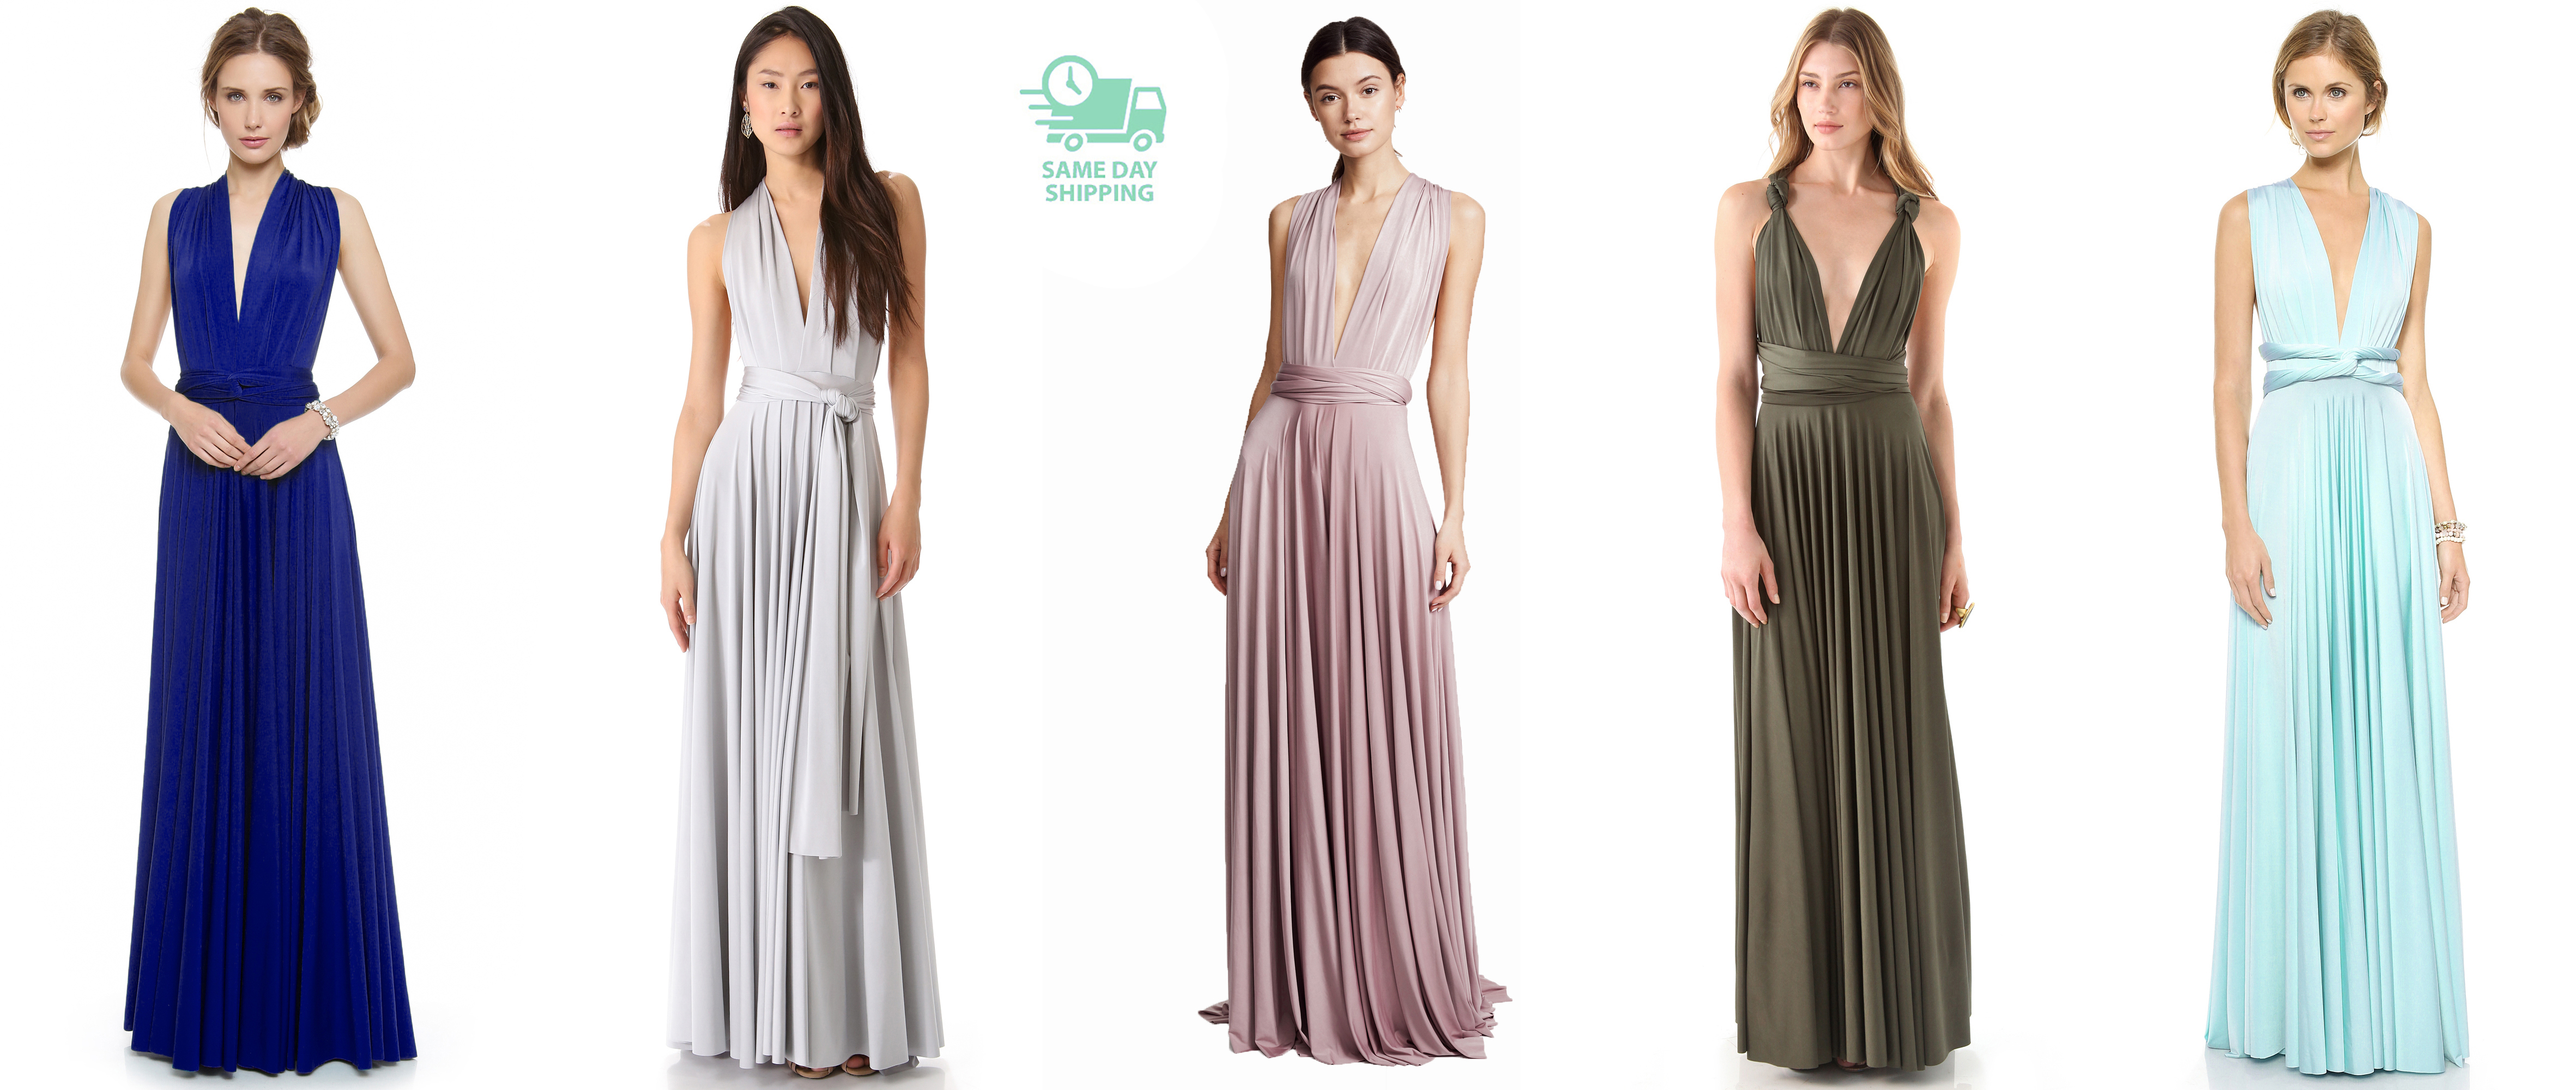 dca2214b5aae0 Convertible Wrap Dress